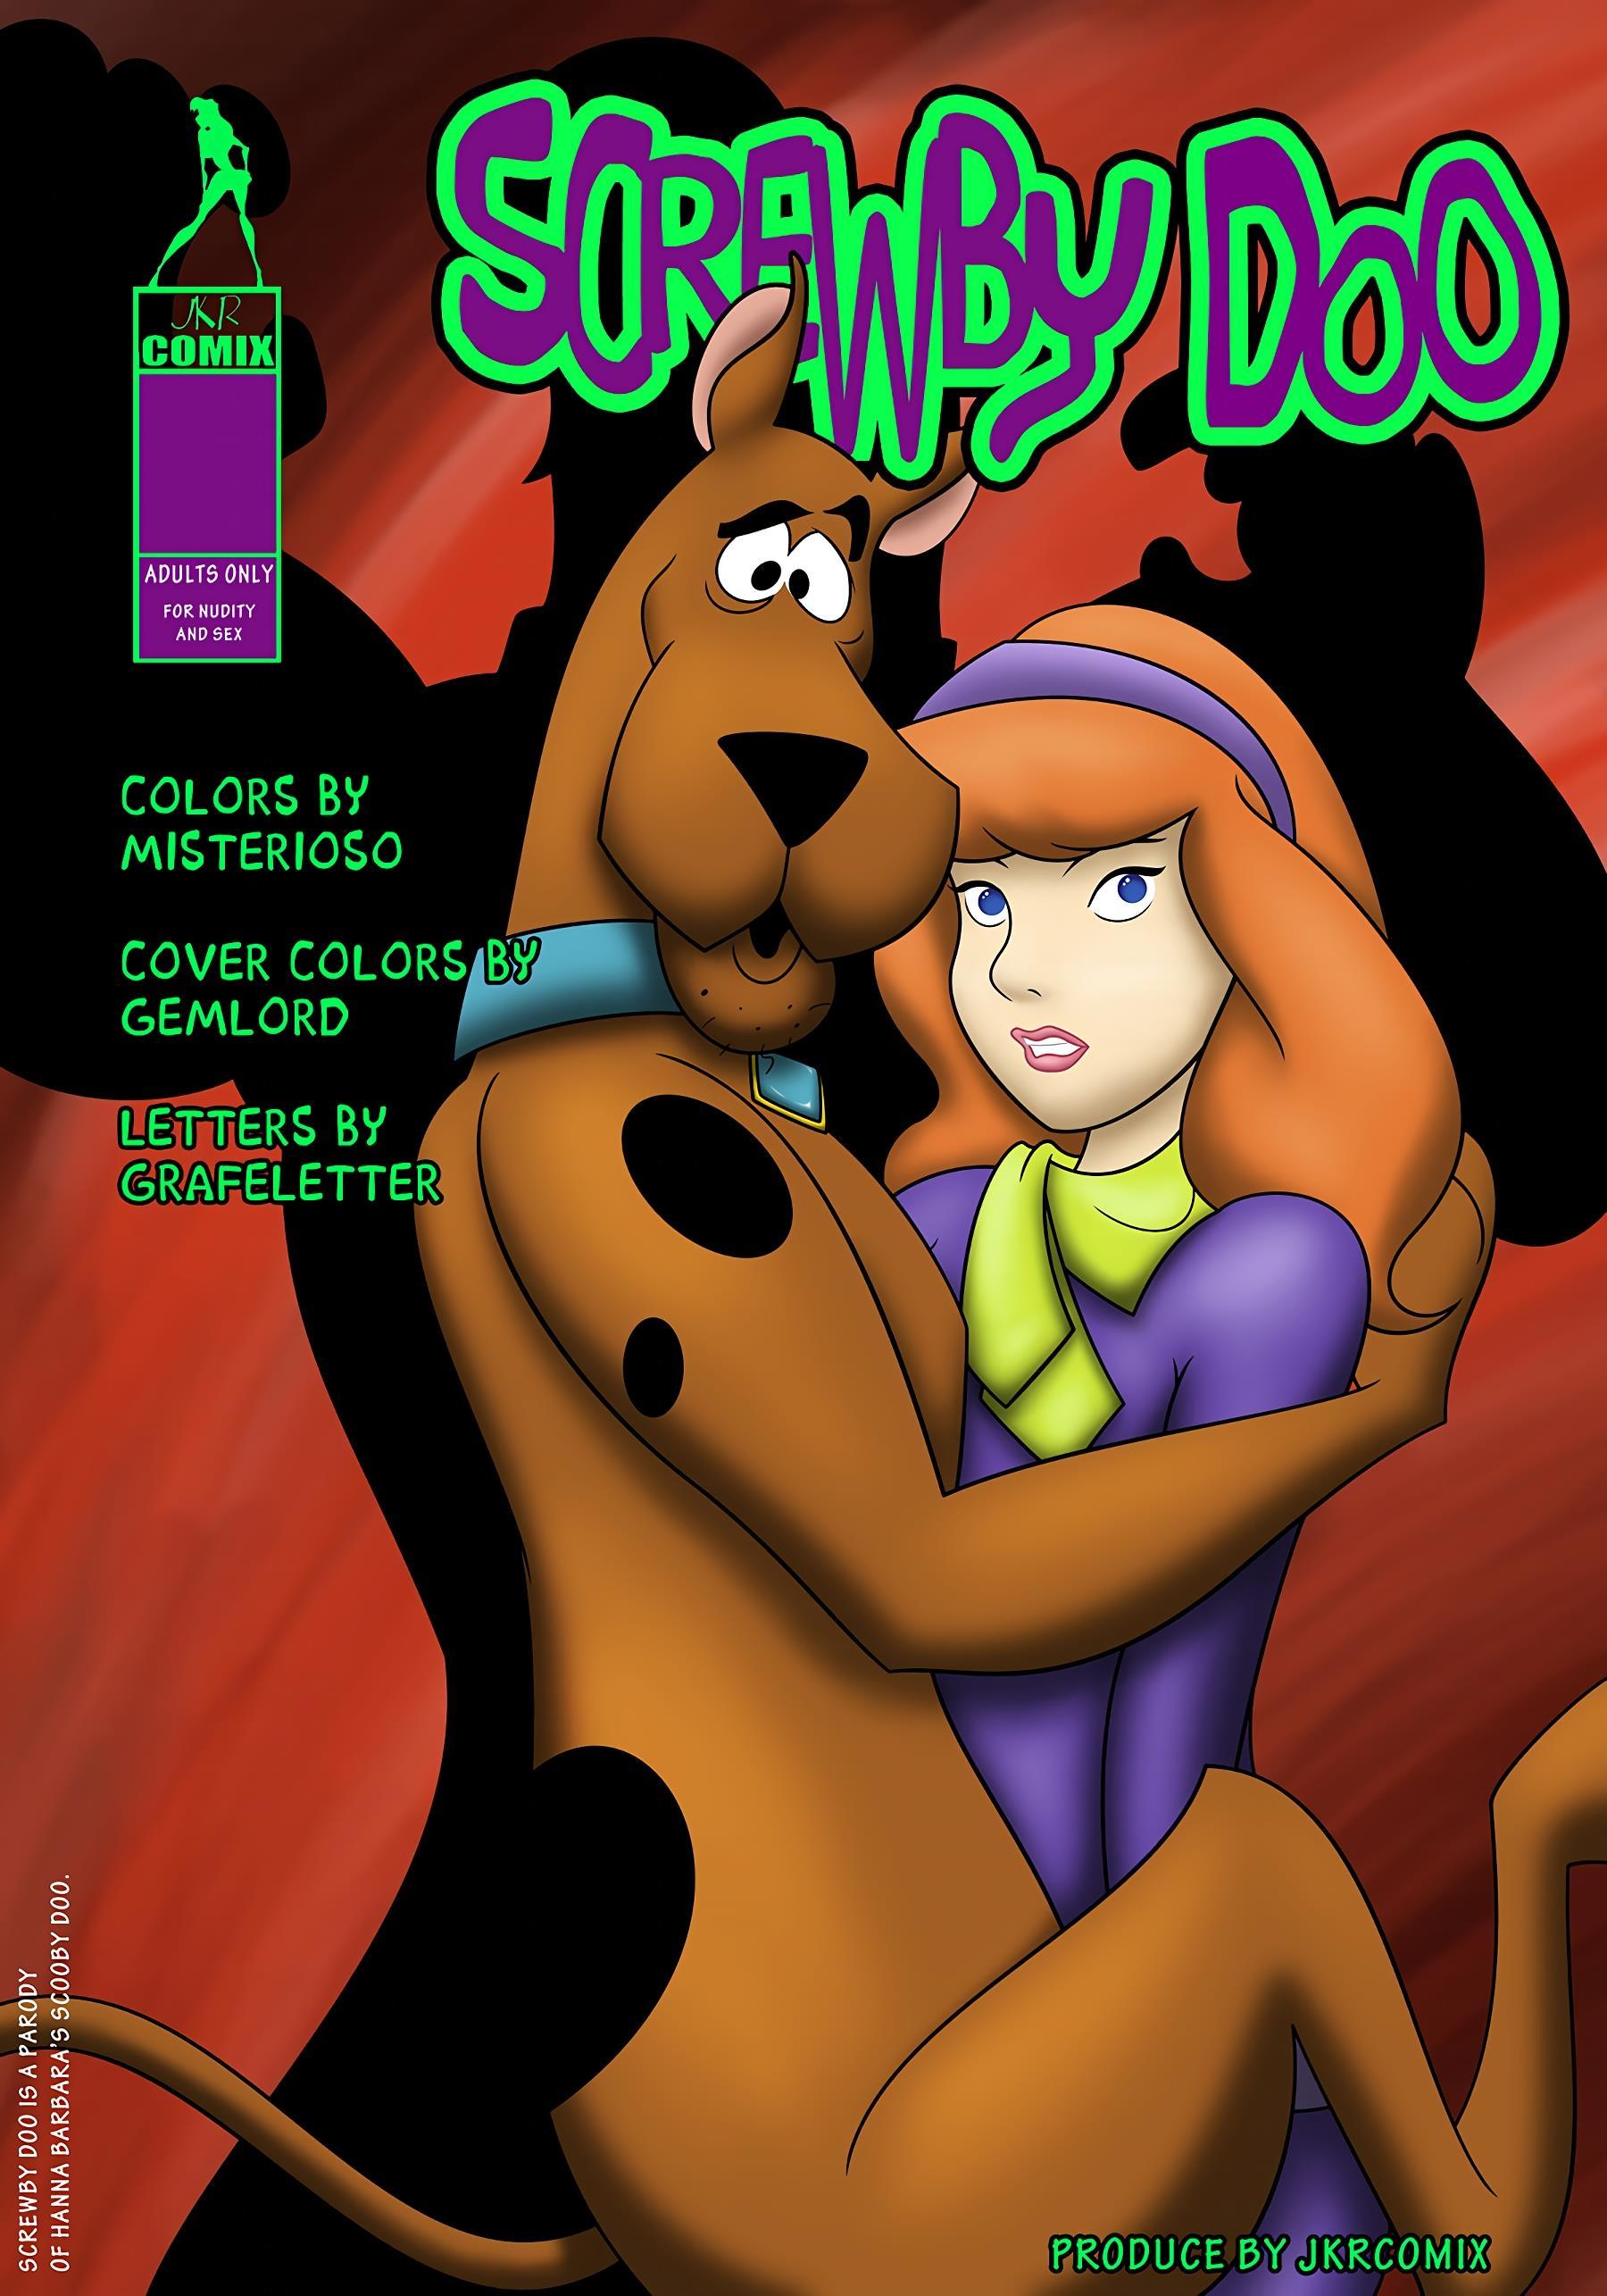 Scooby-Doo-A-primeira-vez-de-Daphne-1